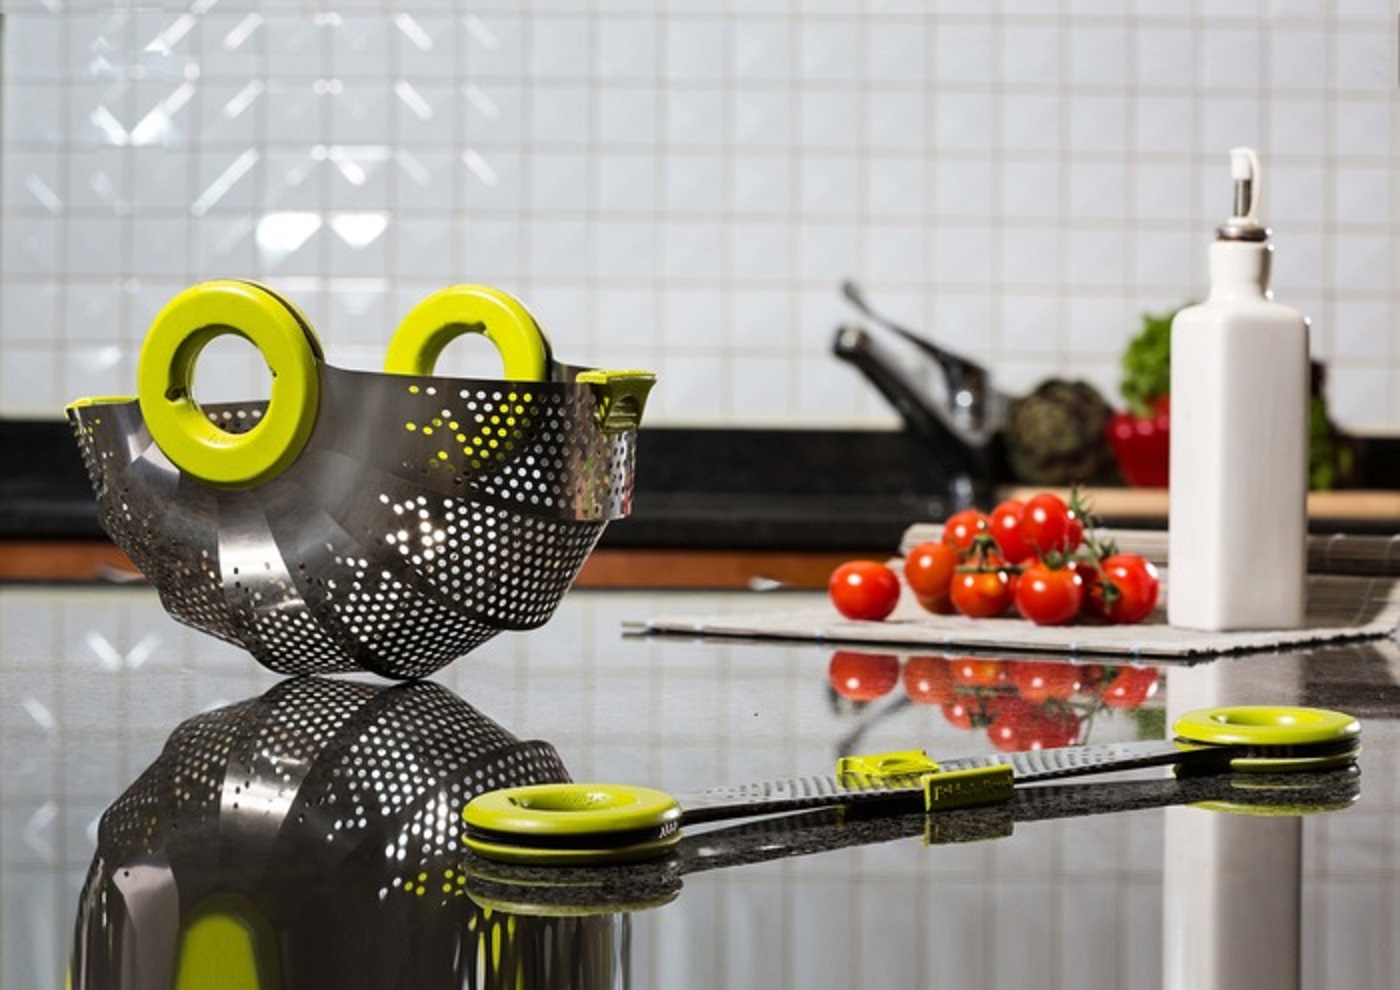 Consumer Video: 10 Cool Kitchen Gadgets – Part 1